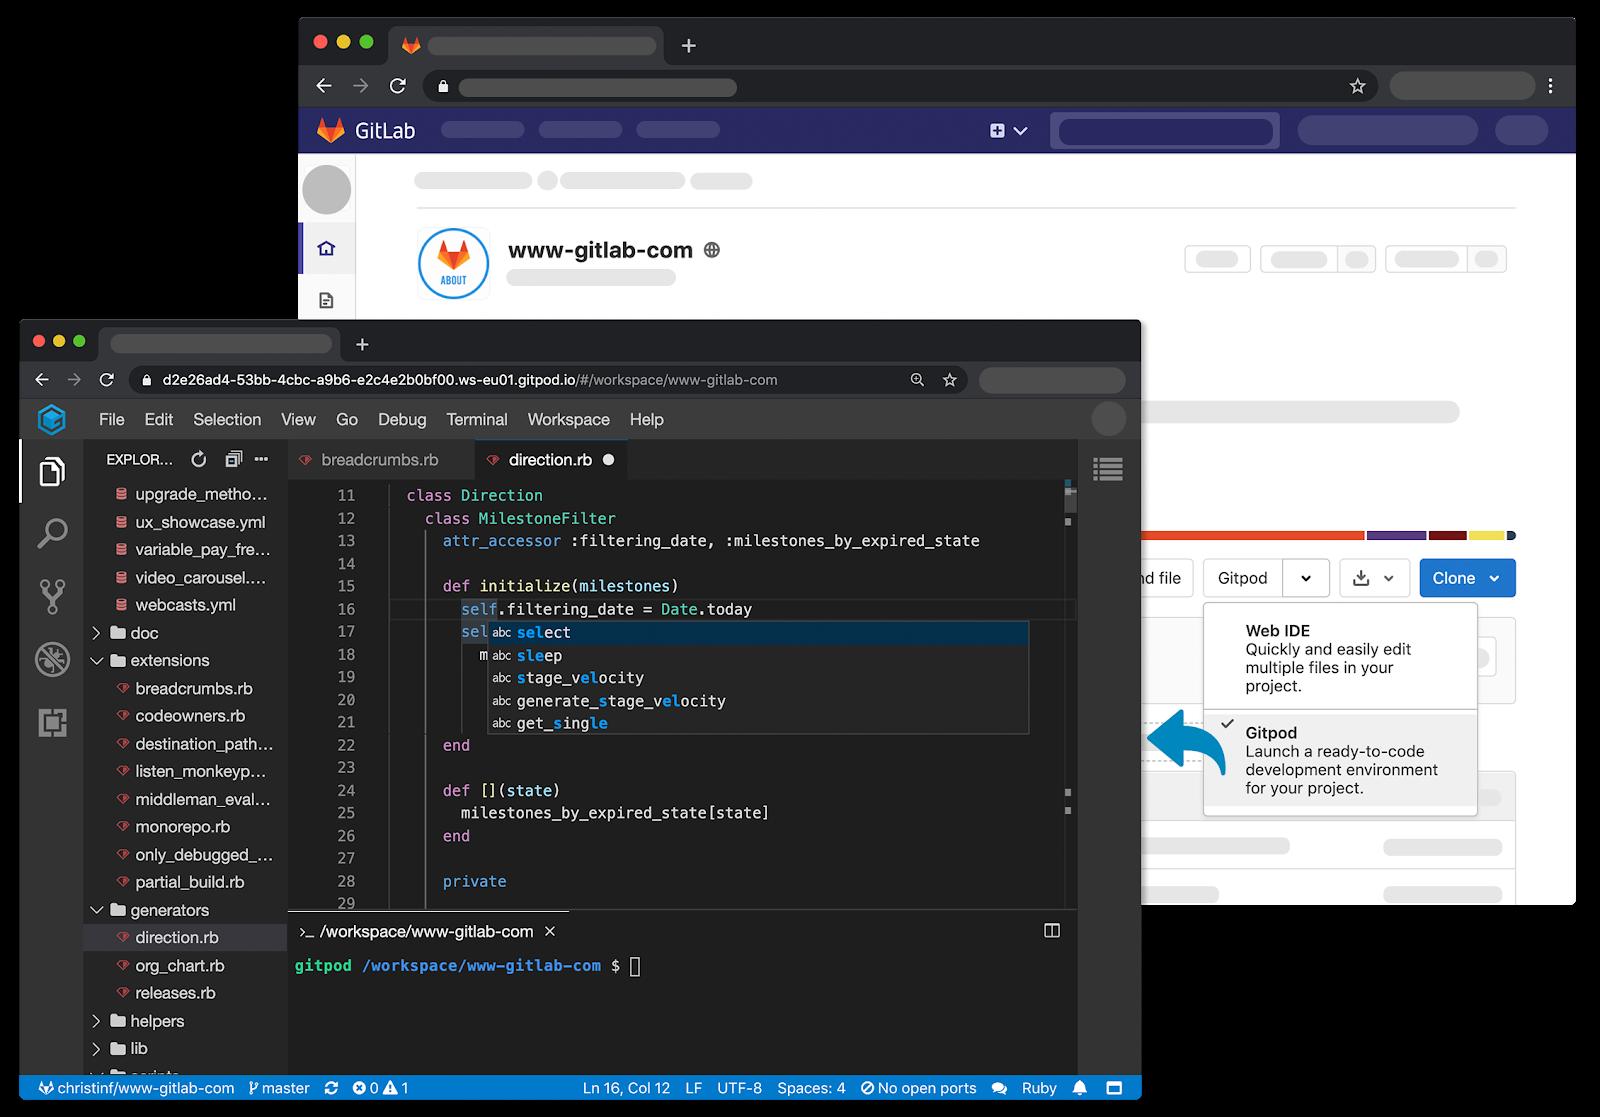 Native Gitpod integration in GitLab